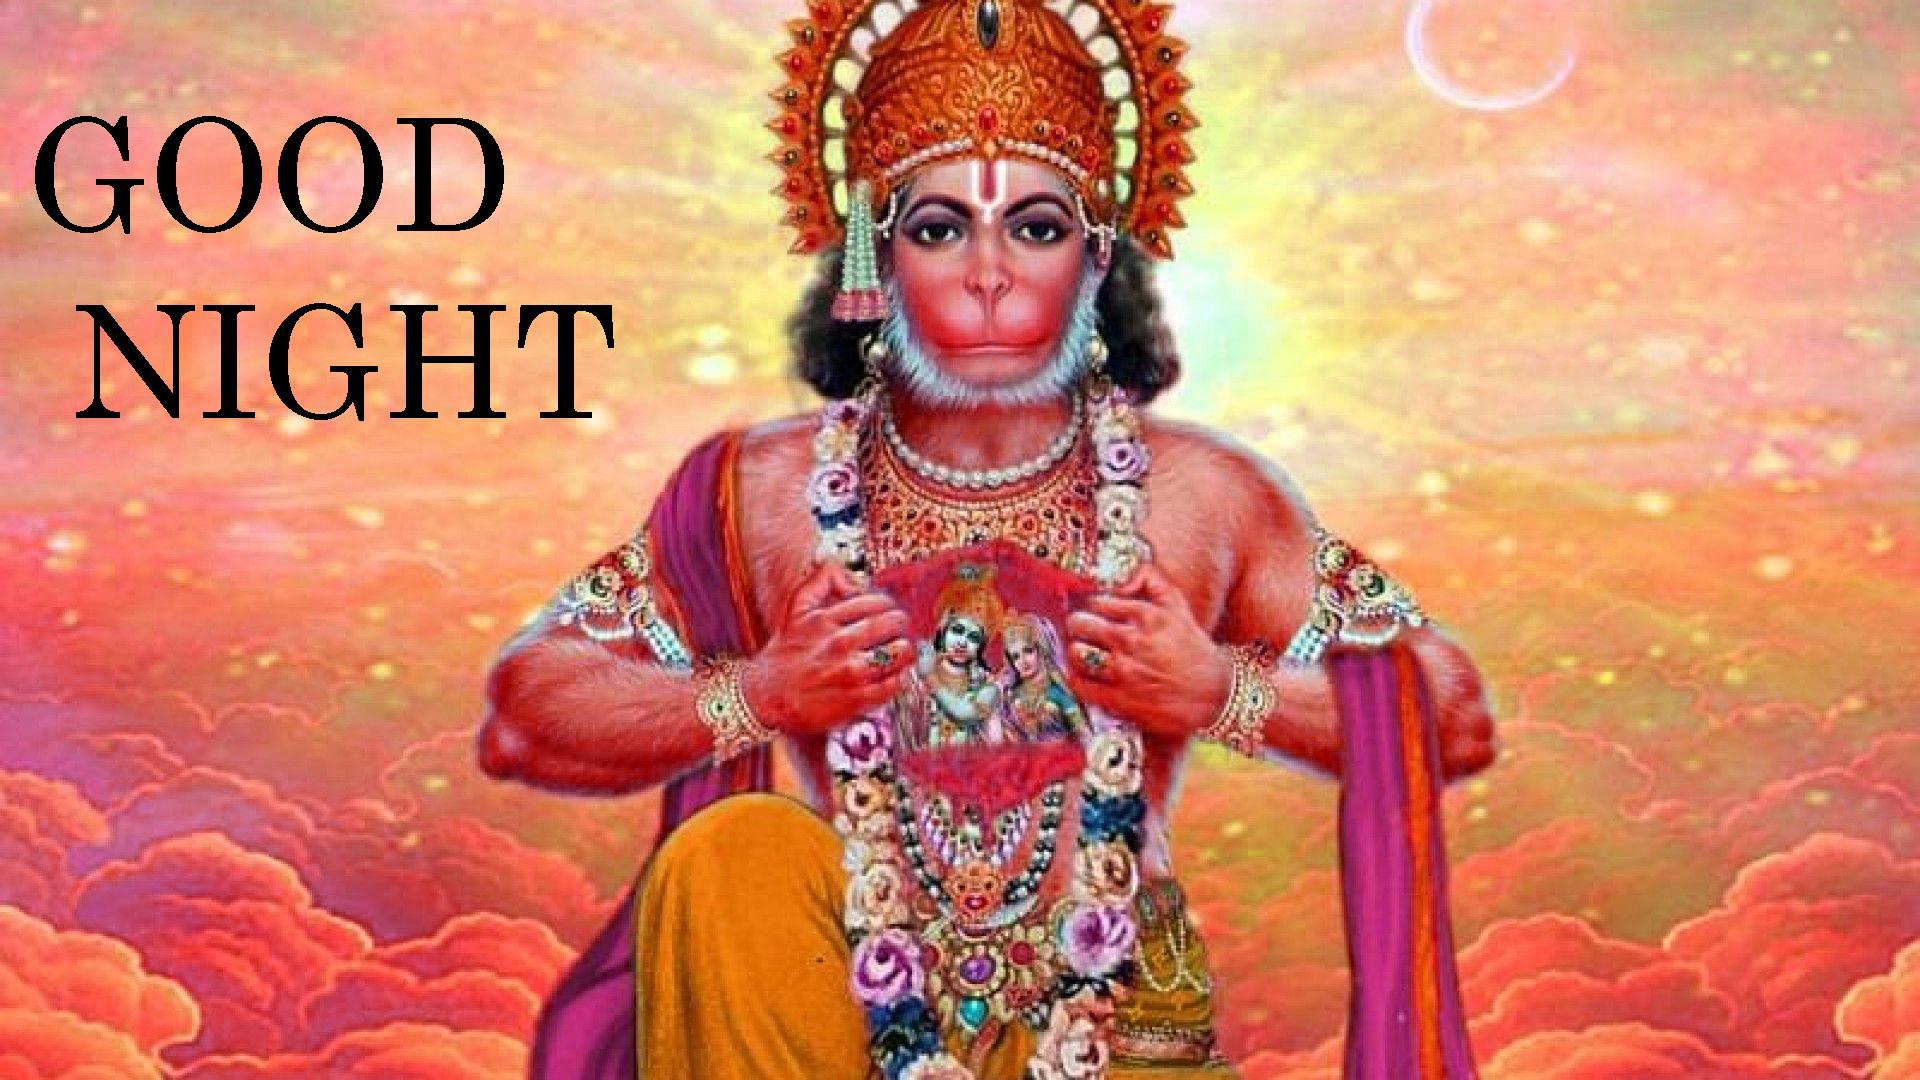 172+ God Good Night Images Photo Pics HD Download